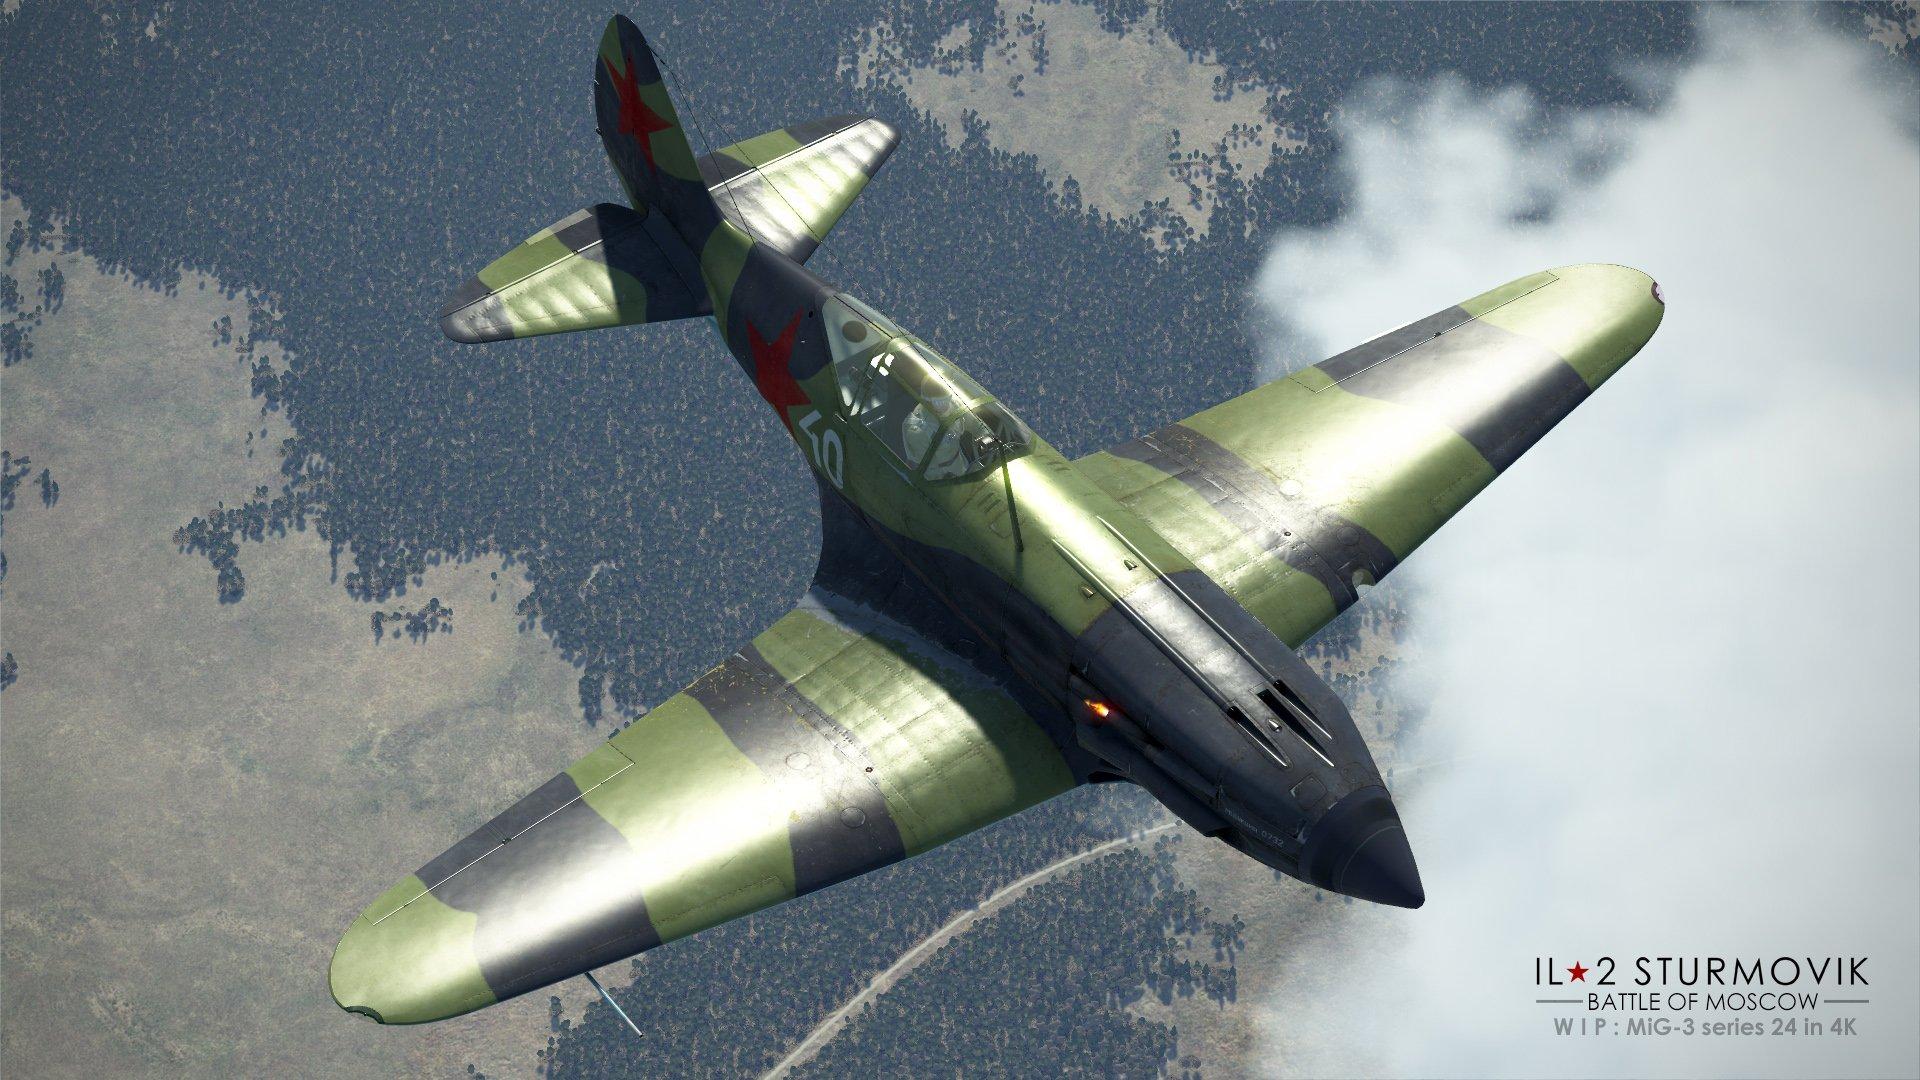 forum.il2sturmovik.com/uploads/monthly_2020_02/MiG3_1.jpg.5f5520686365b616983a662223afc64e.jpg